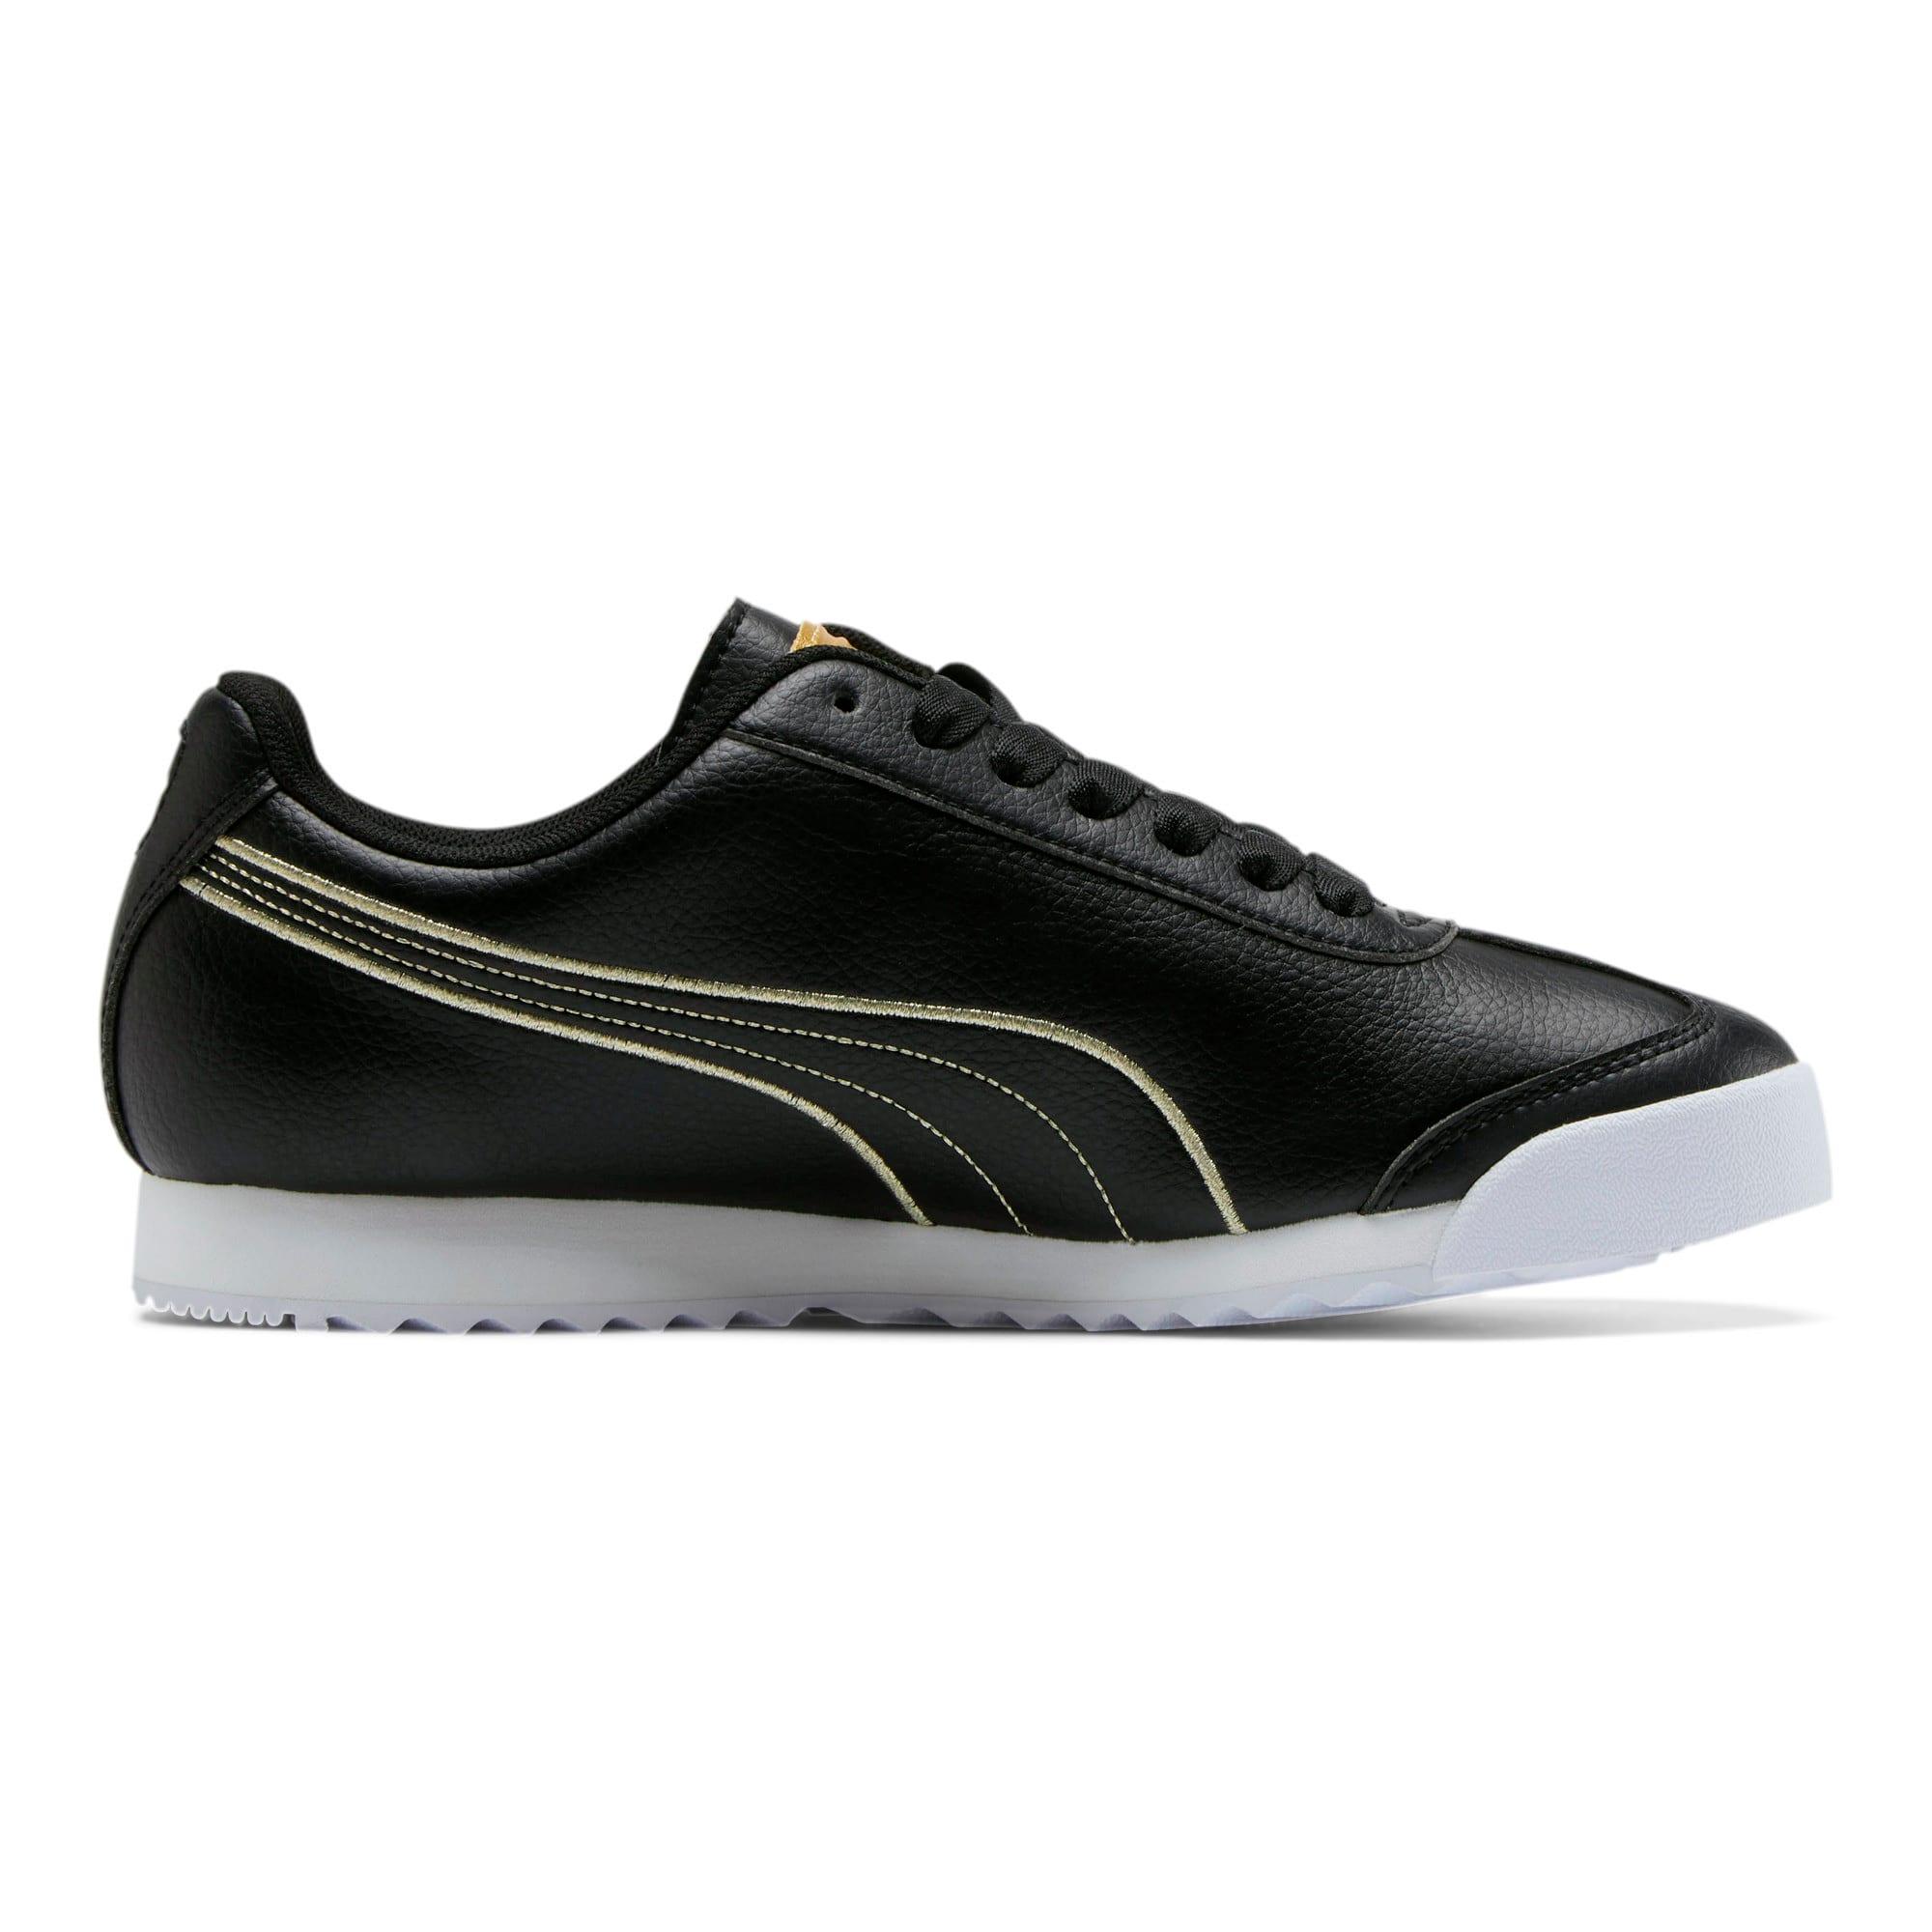 Thumbnail 5 of Roma Metallic Stitch Women's Sneakers, Puma Black-Puma Team Gold, medium